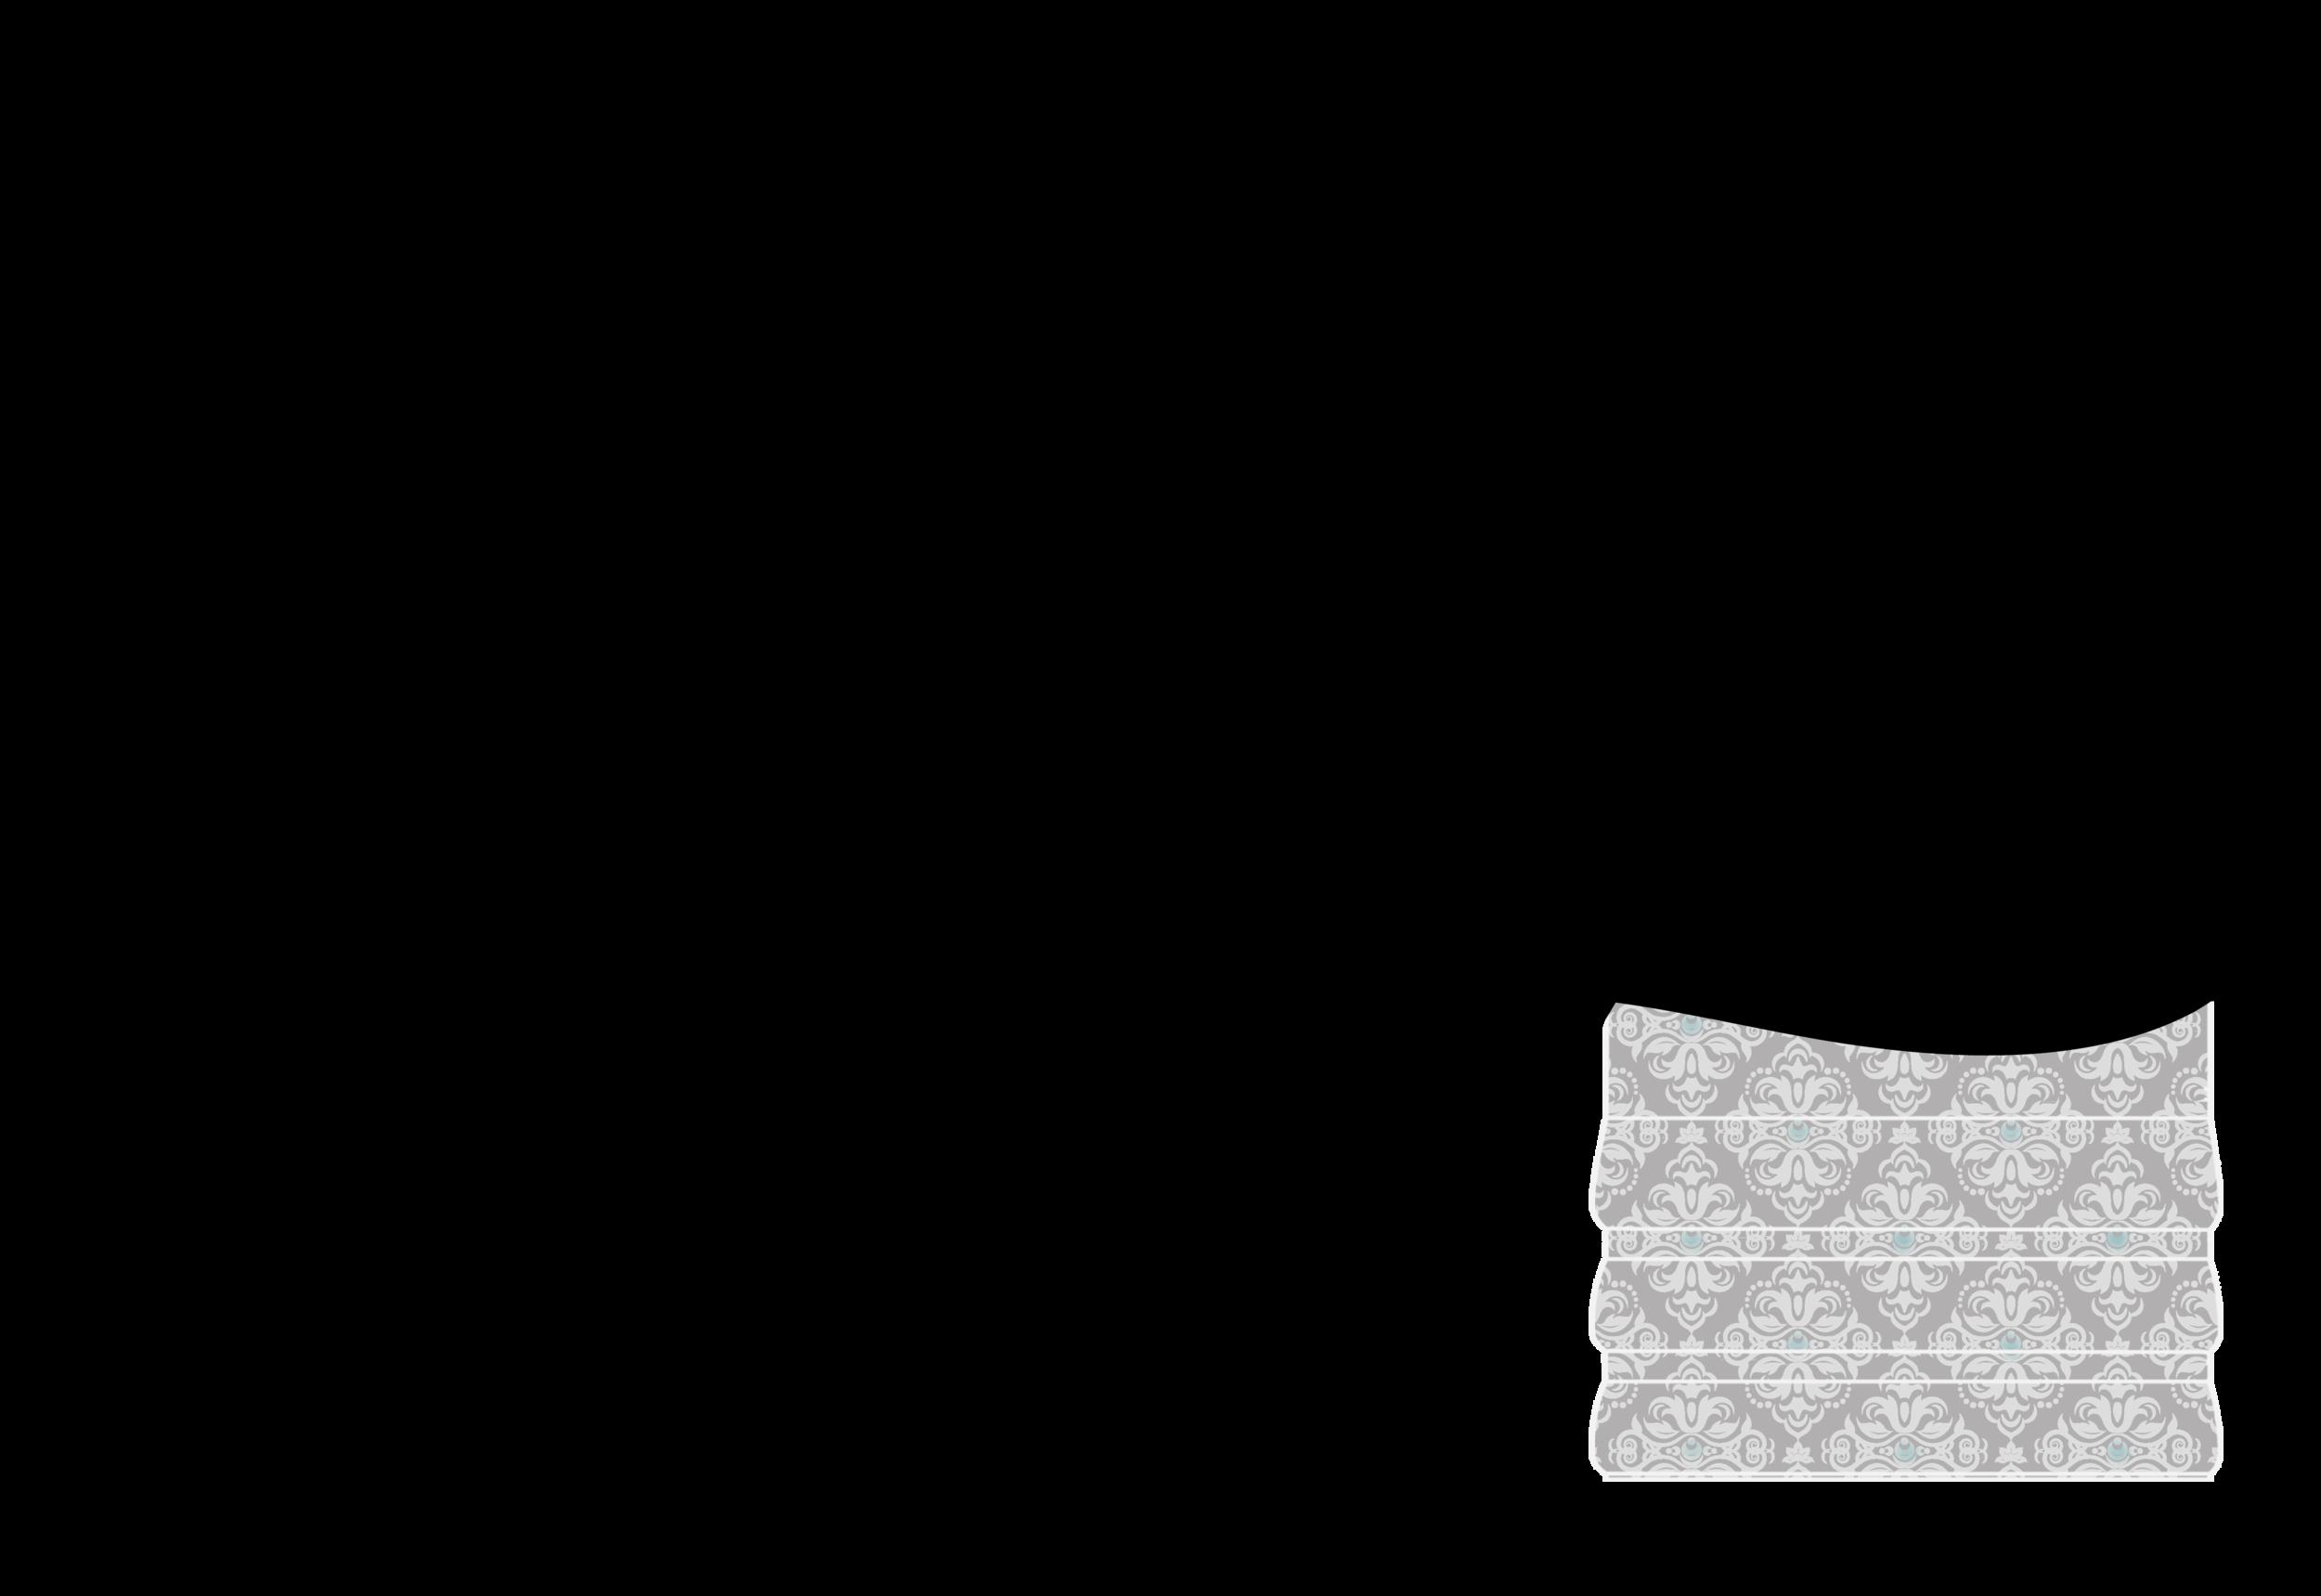 Sew Lovely logo (1).png